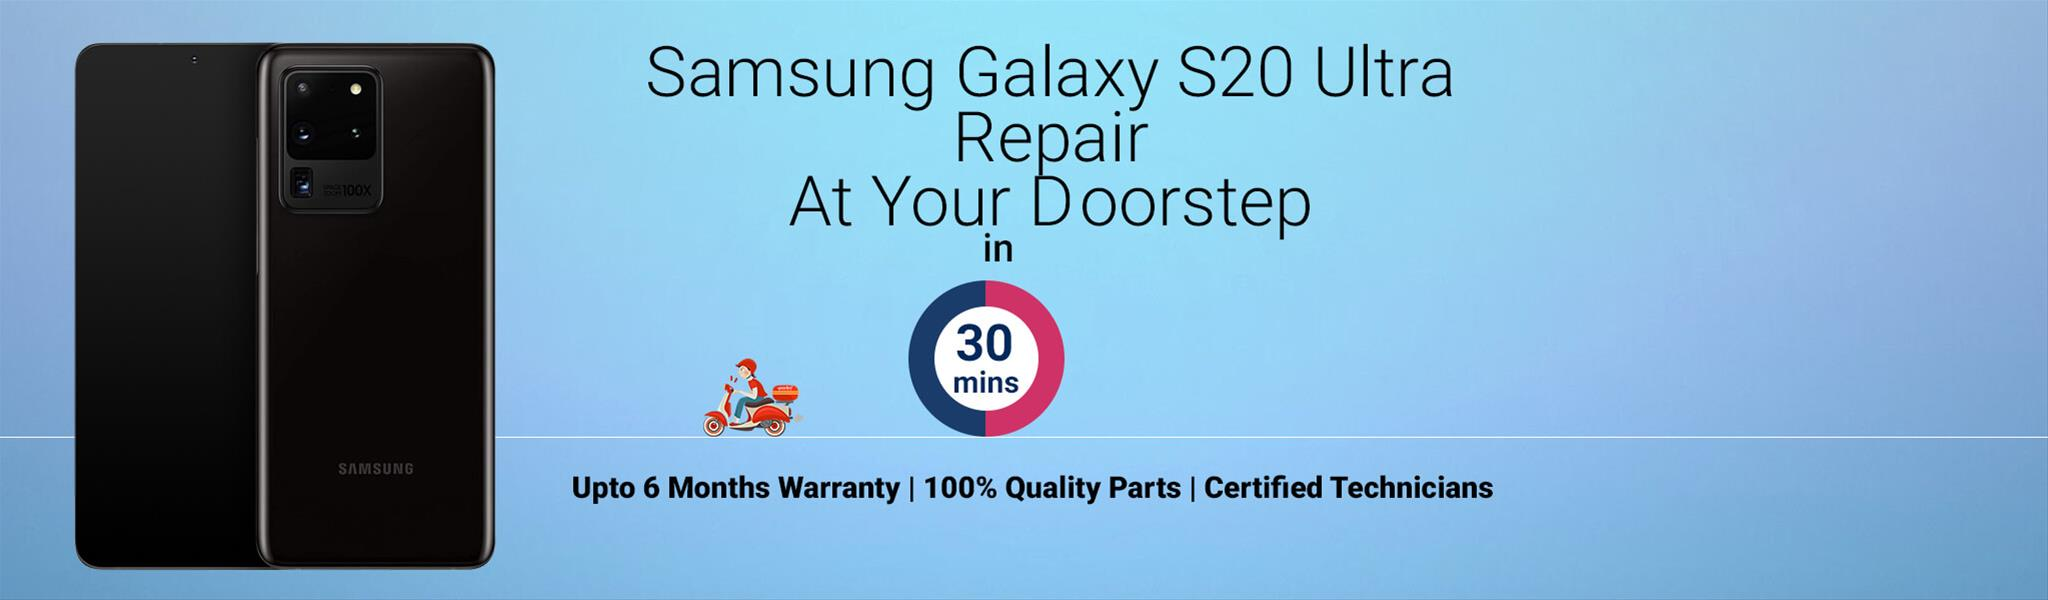 Samsung-S20-ultra-repair.jpg